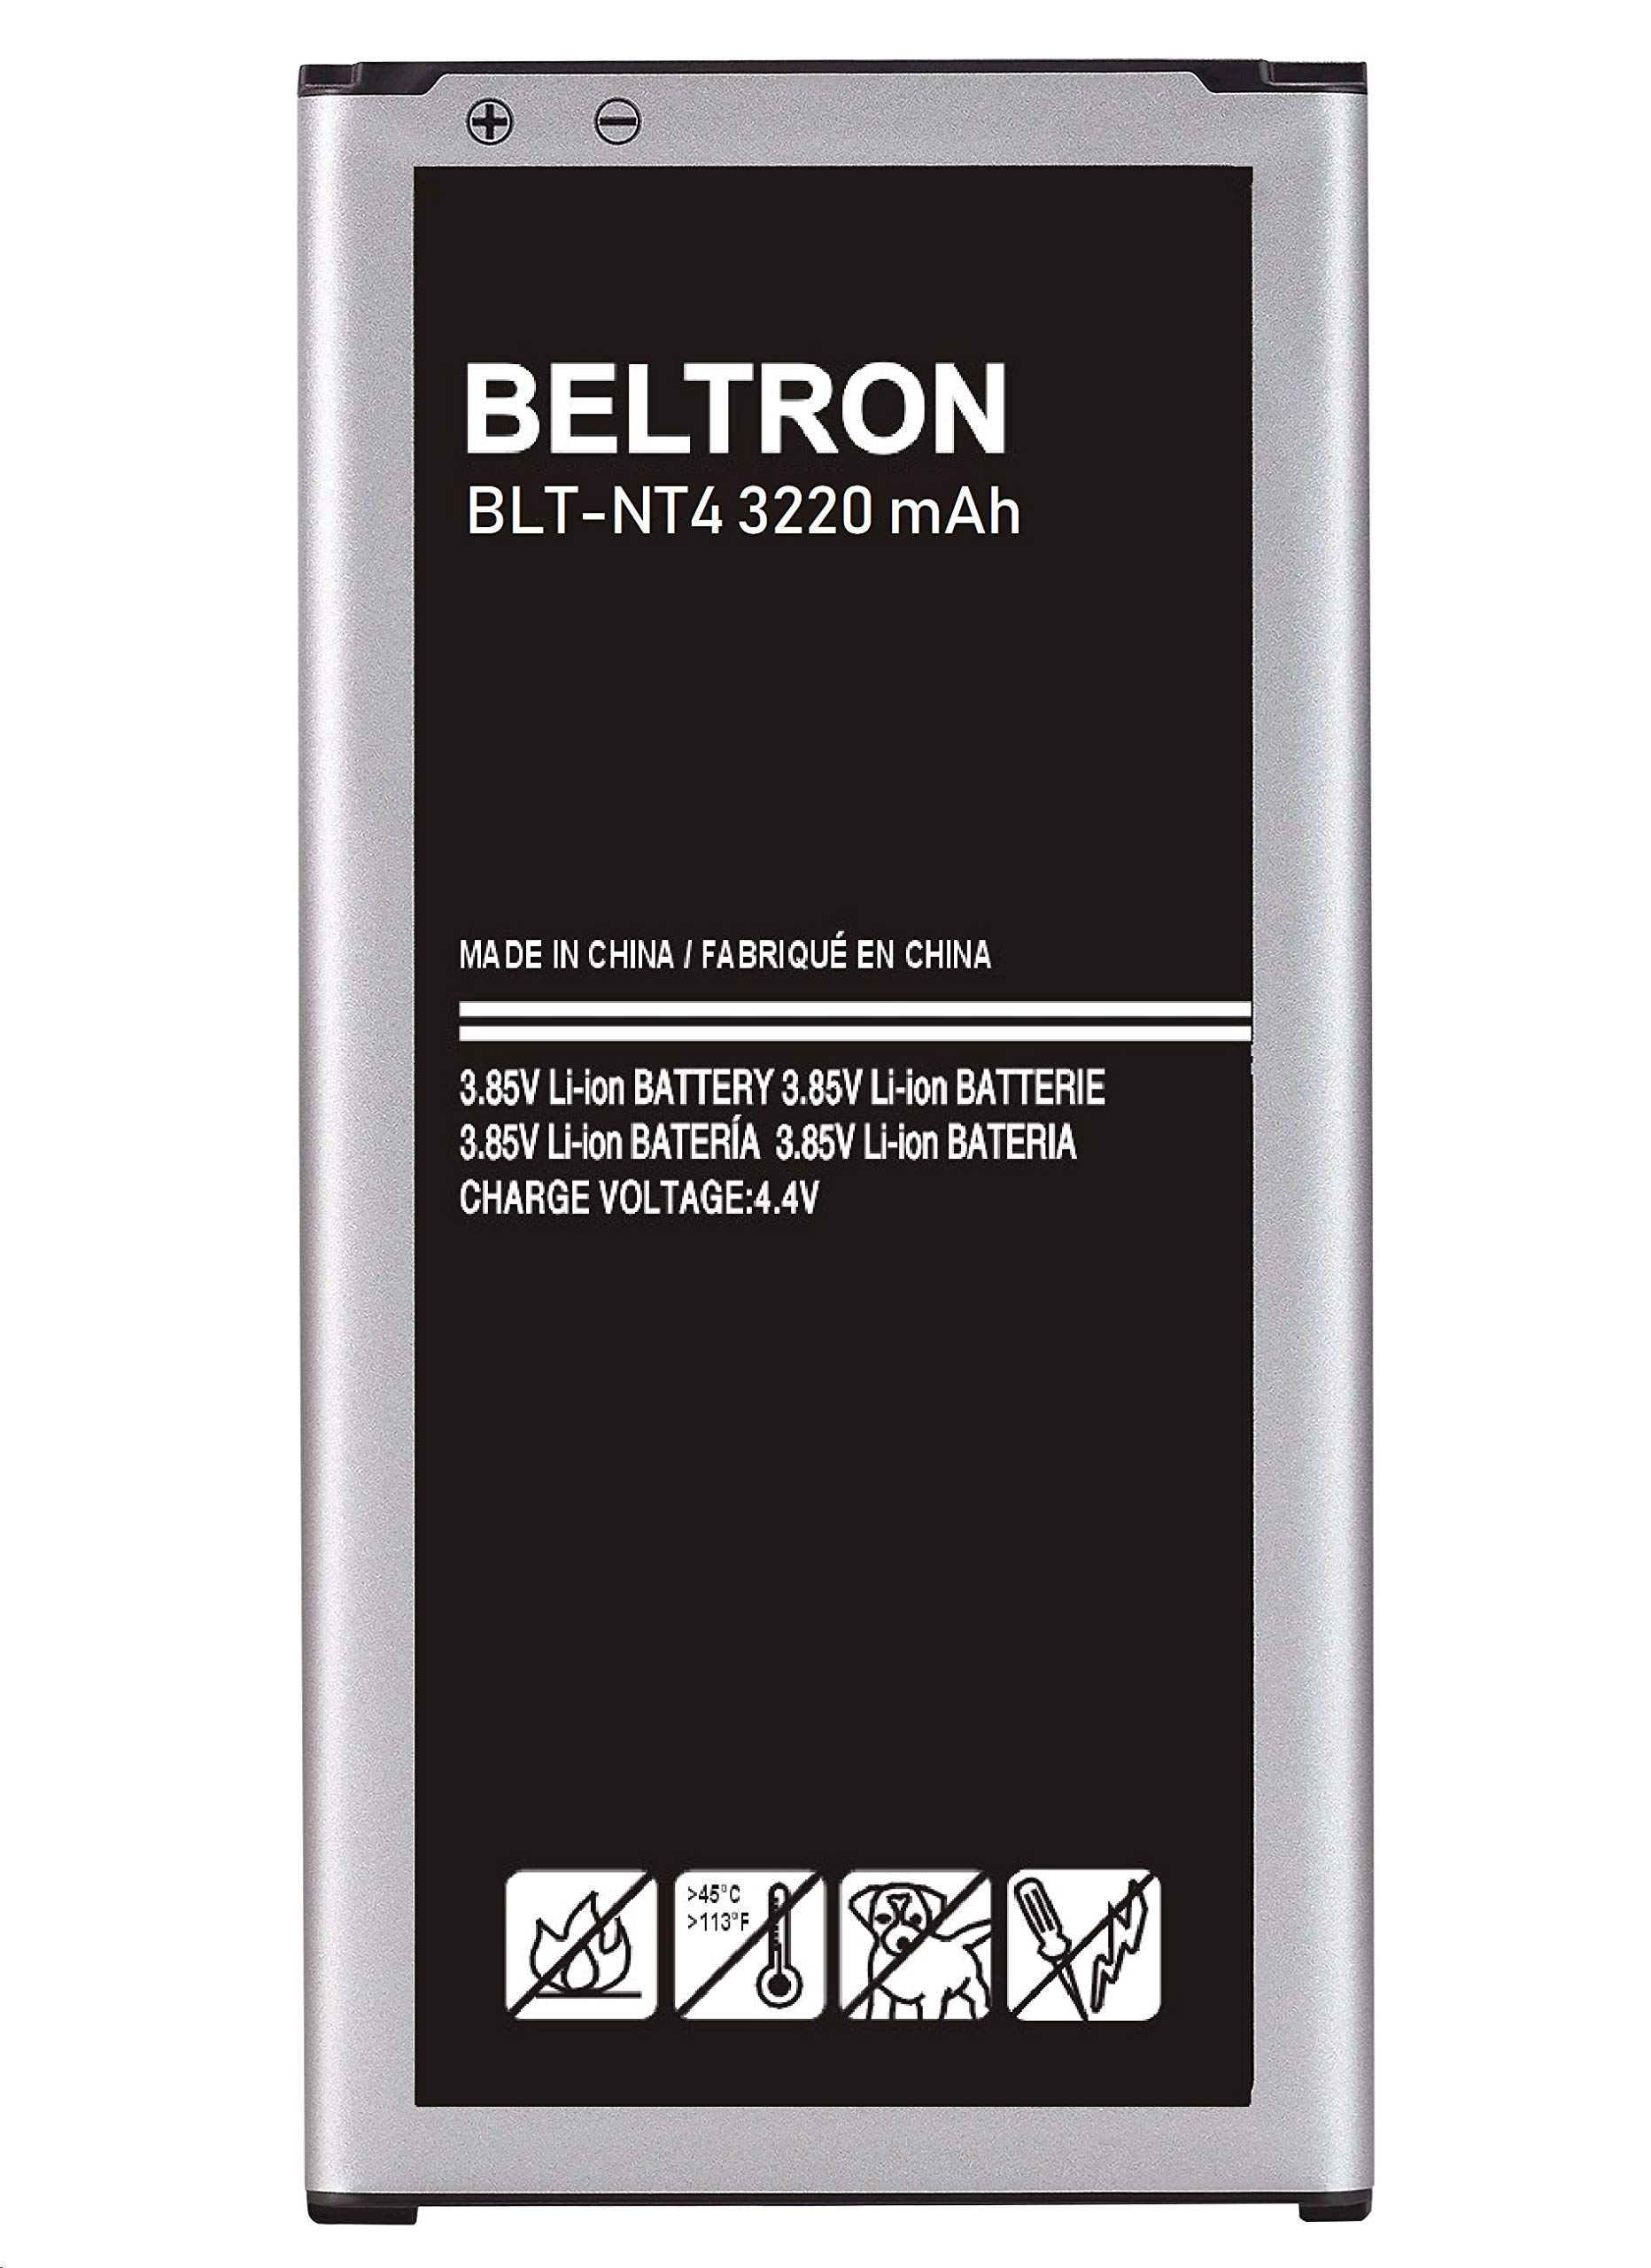 Bateria Beltron Para Samsung Galaxy Note 4 Sm N910 At&t Sprint Us Cellular Eb Bn910bbu